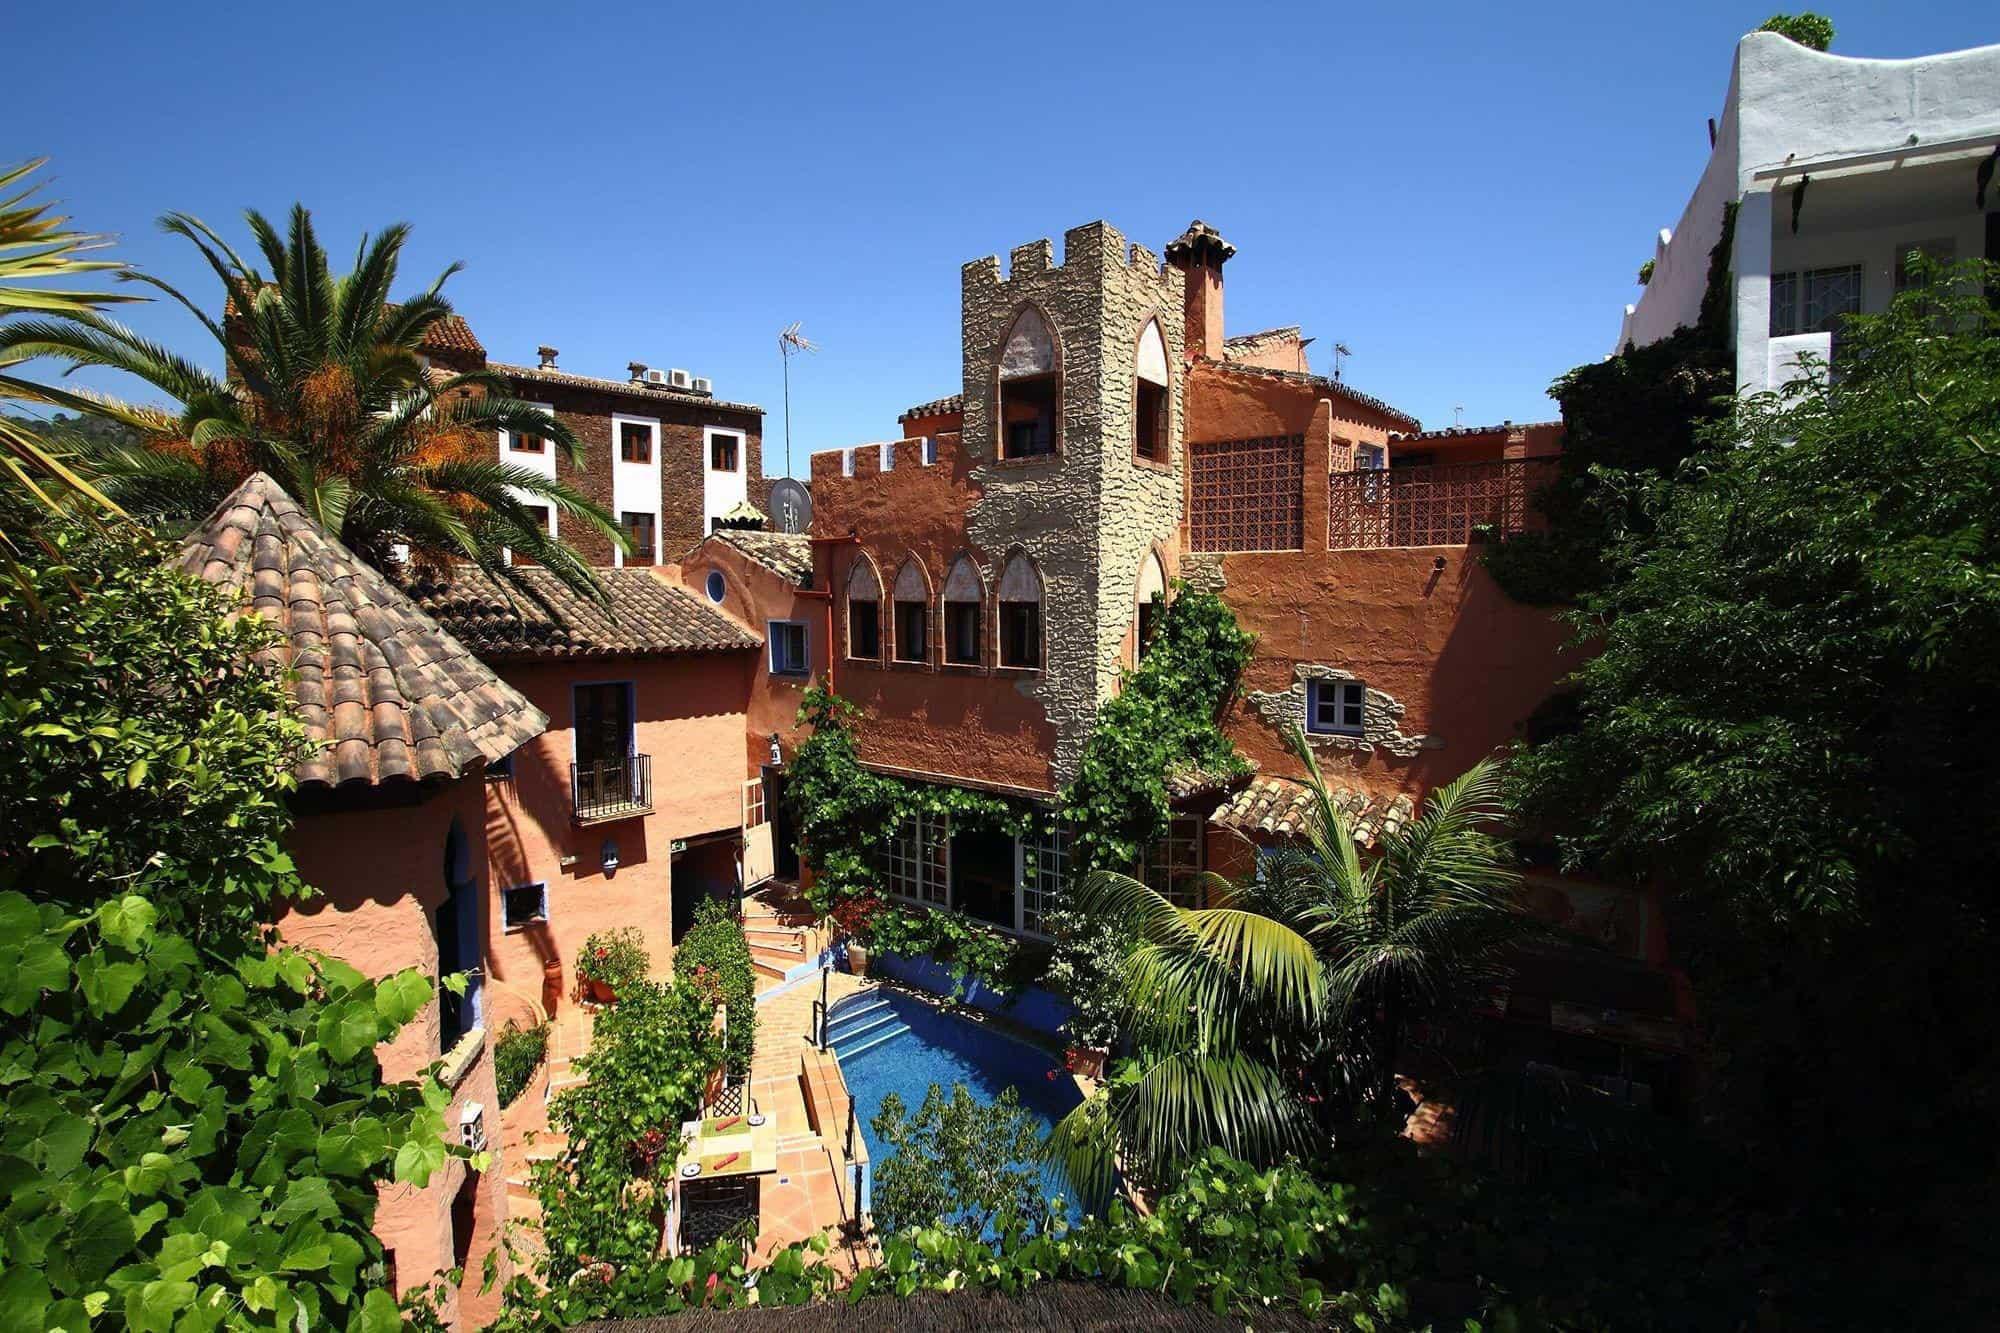 hotel amanhavis benahavis golf accomodation